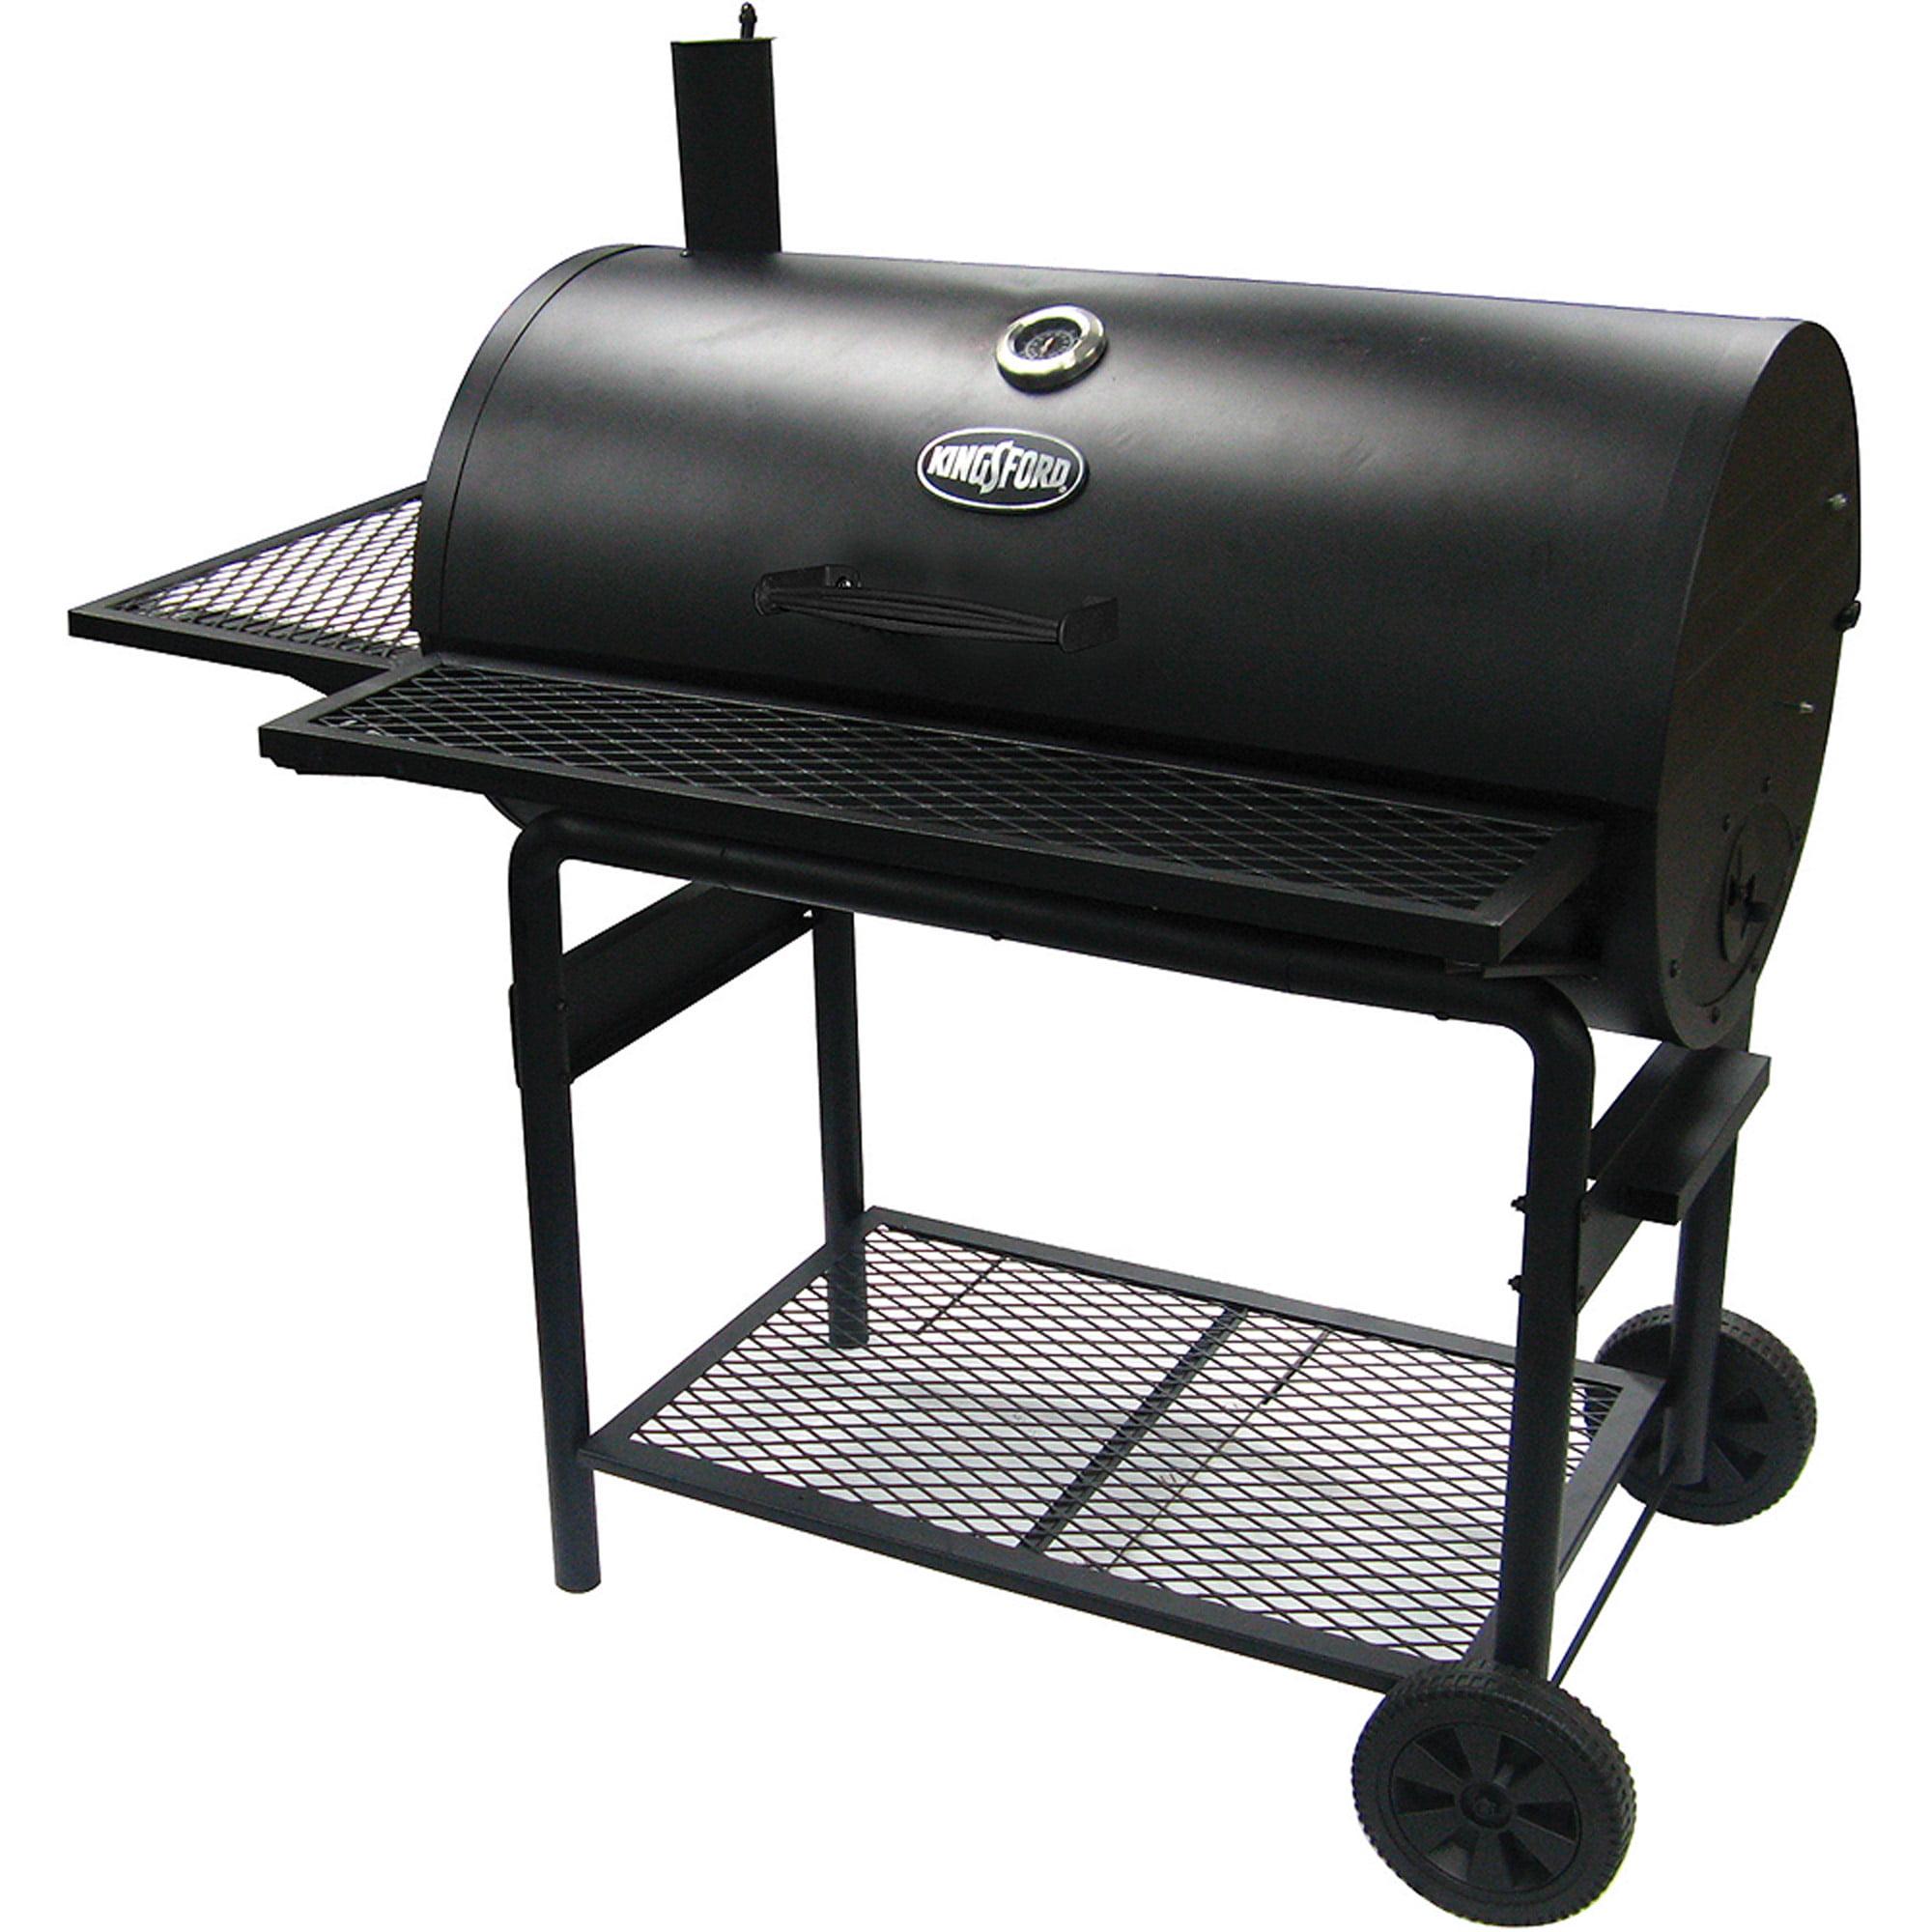 "Kingsford 37.5"" Barrel Charcoal Grill"